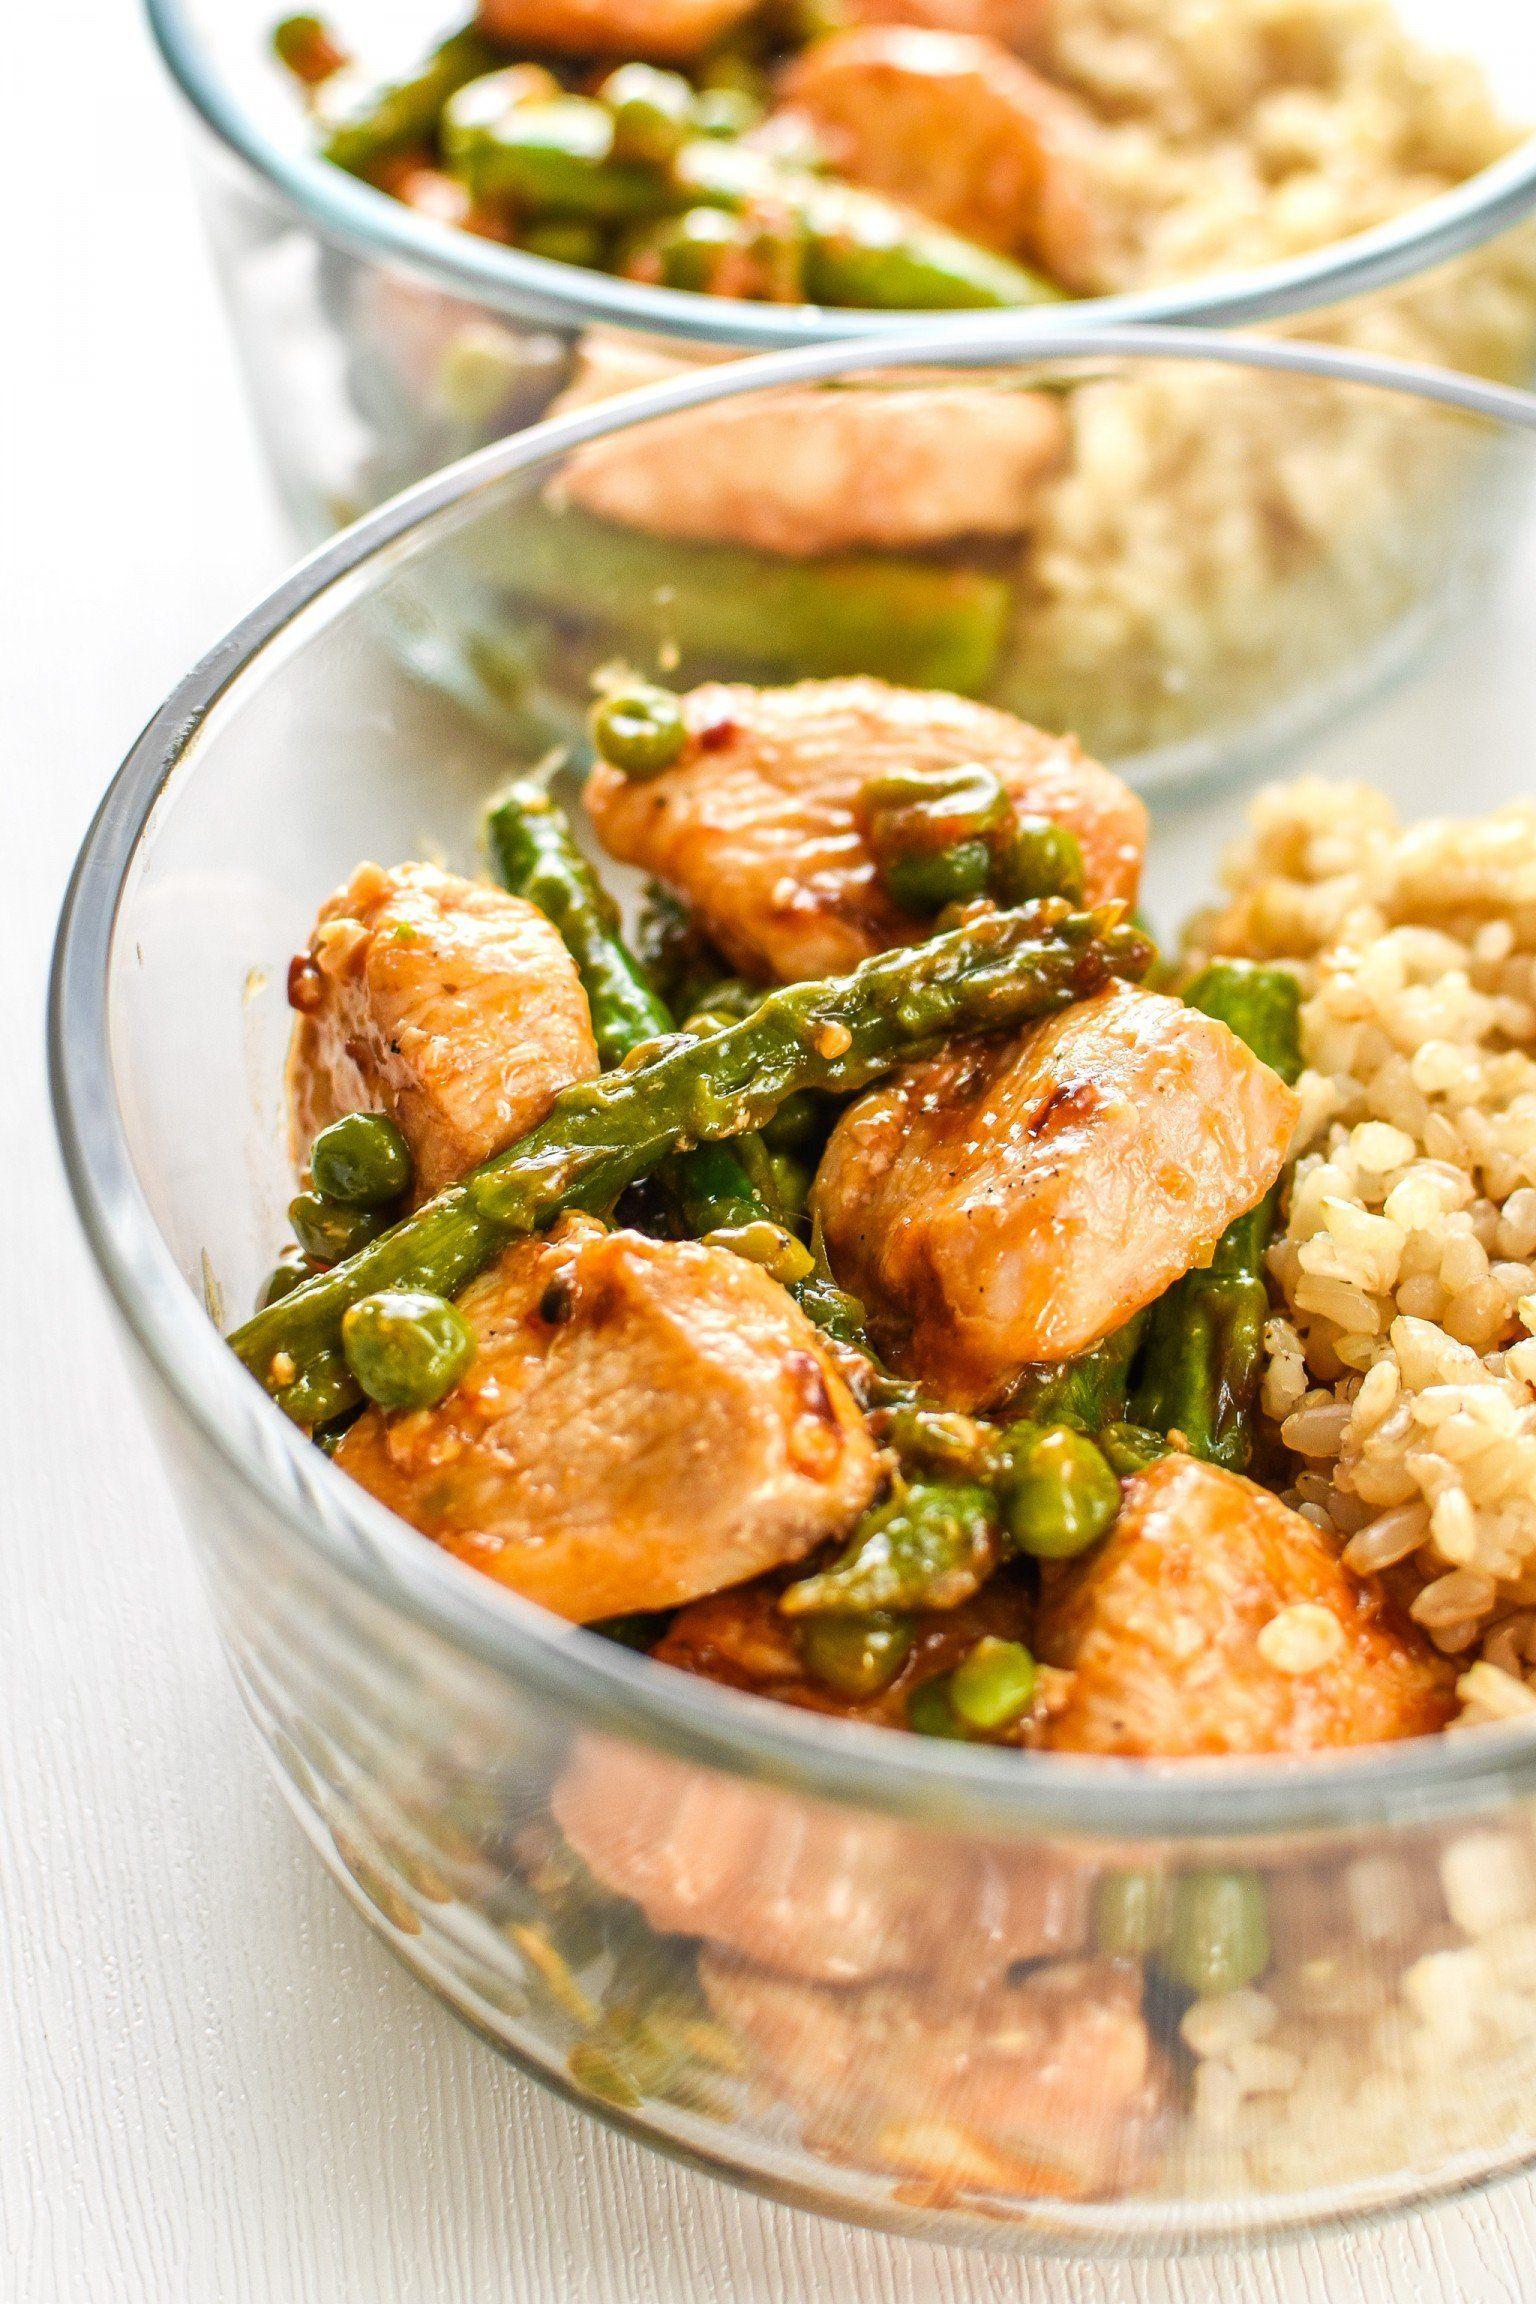 Meal Prep Spicy Chicken and Asparagus Rice Bowls #crockpotmealprep